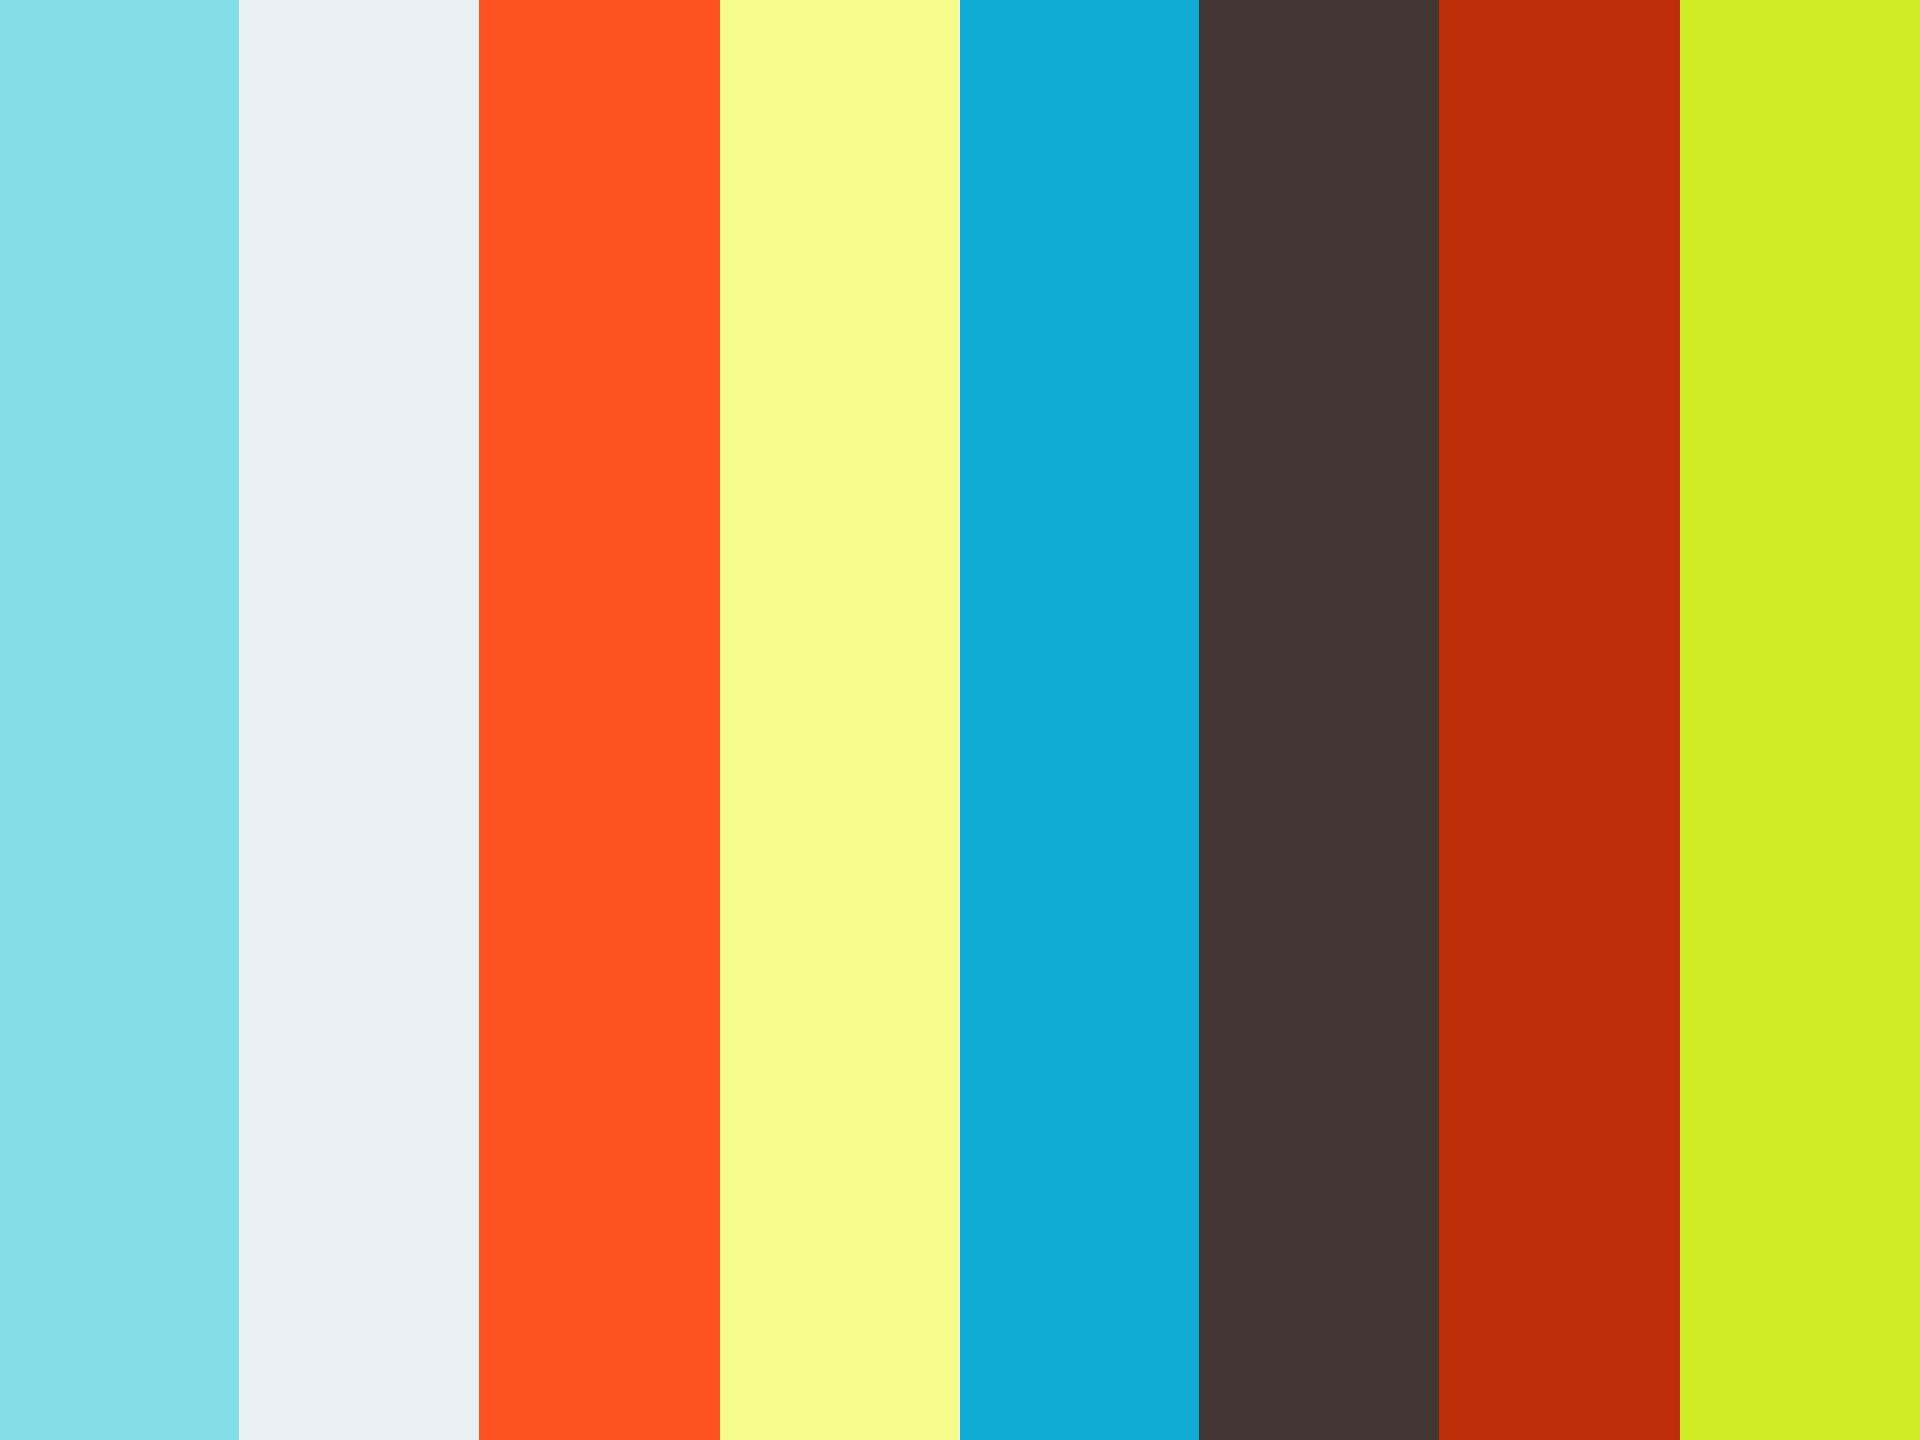 Gleneagles-2x2 Garage-Standard